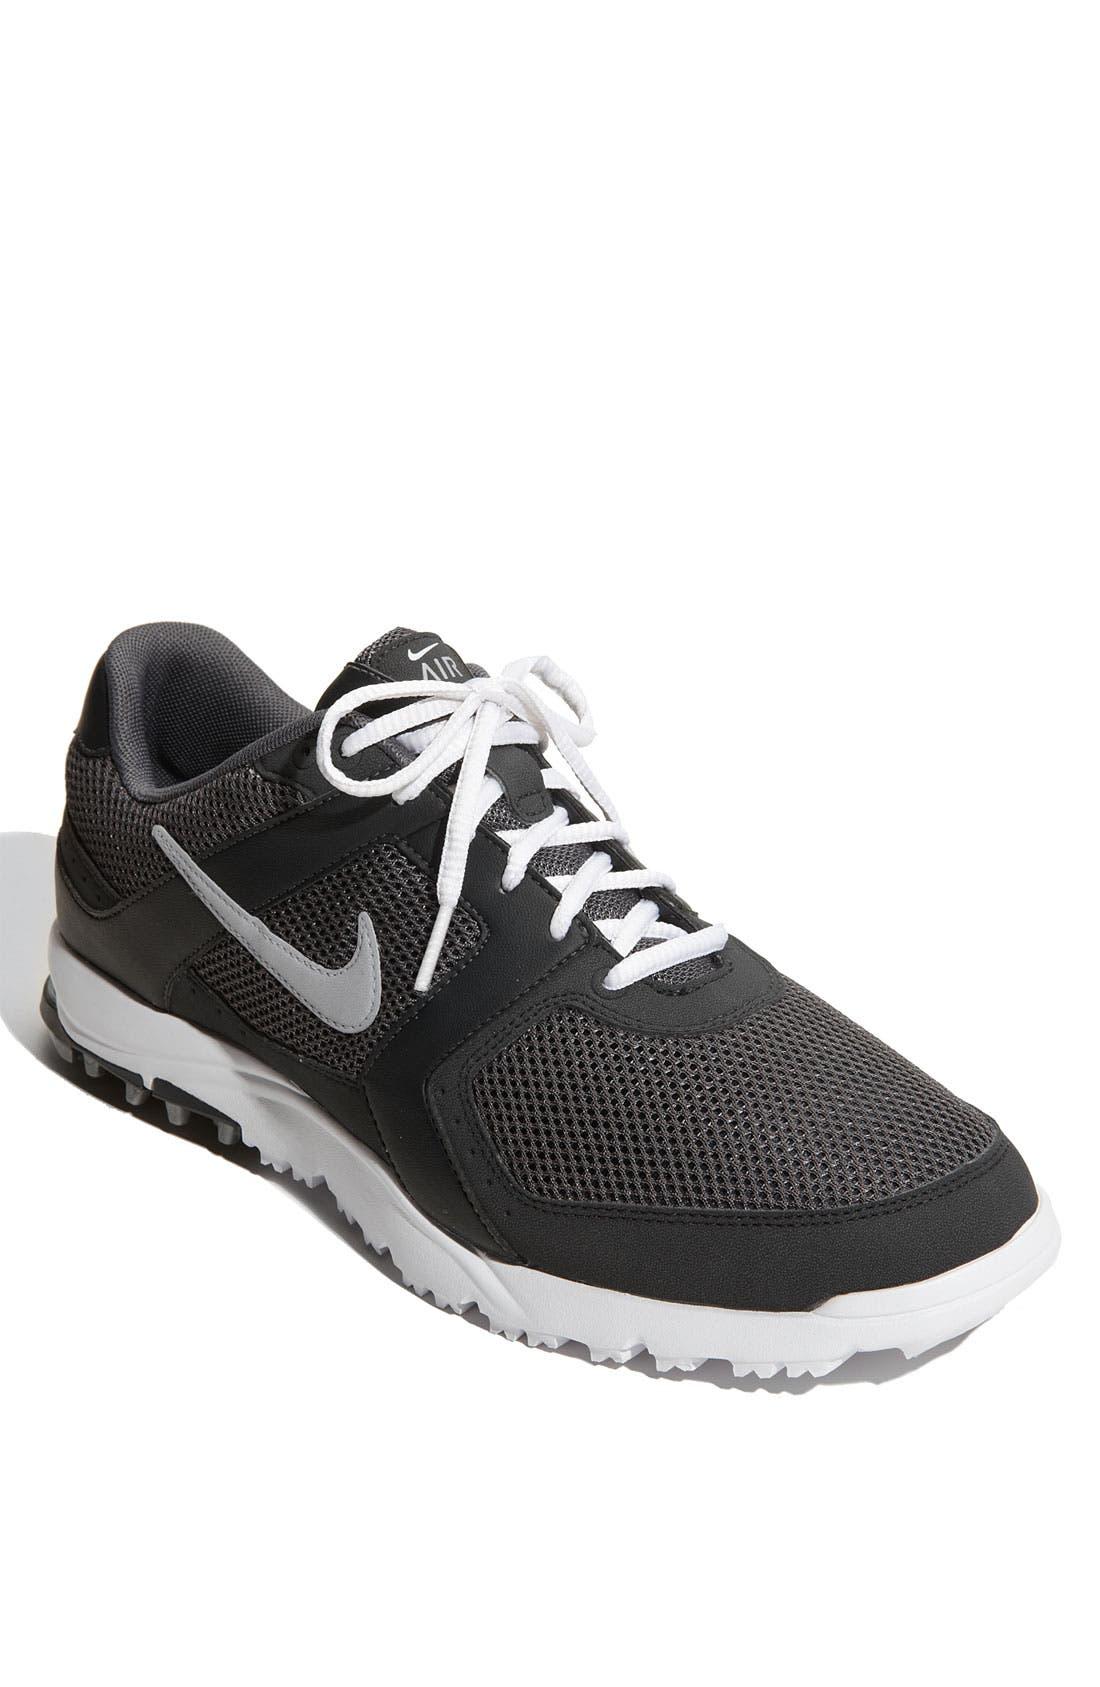 Main Image - Nike 'Air Range WP' Golf Shoe (Men)